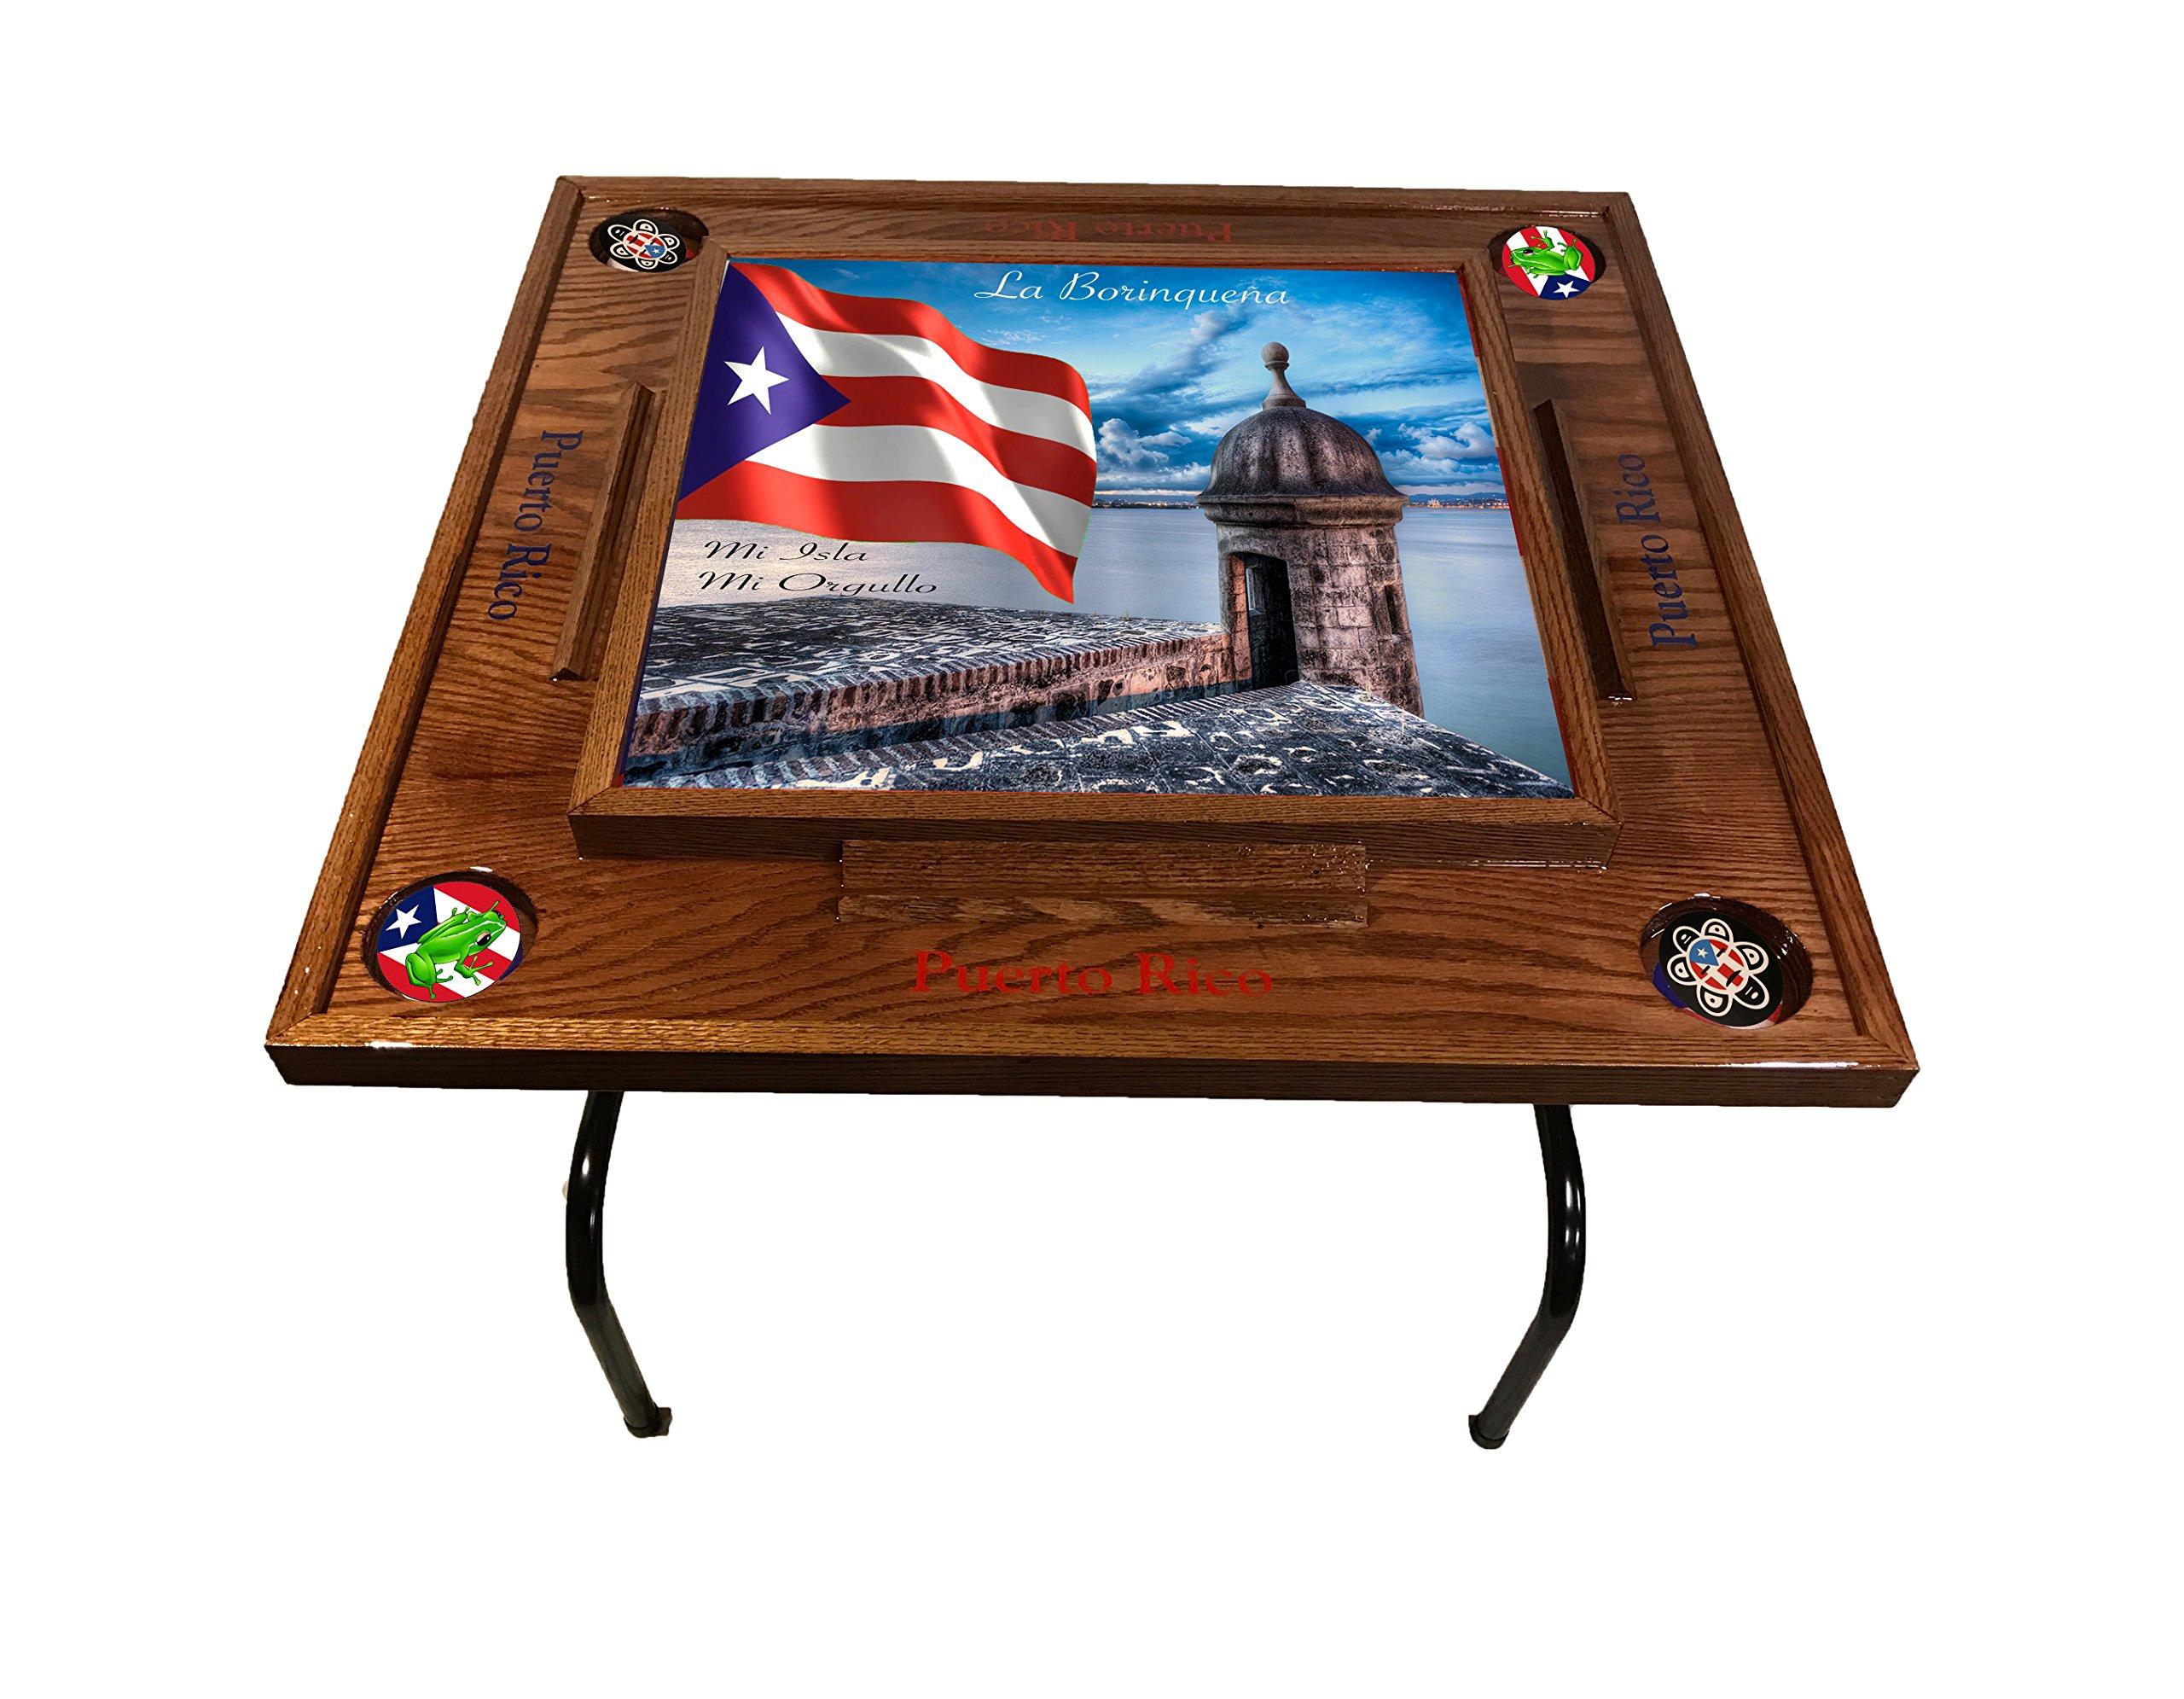 latinos r us Puerto Rico Domino Table with The Morro (Dark Walnut)